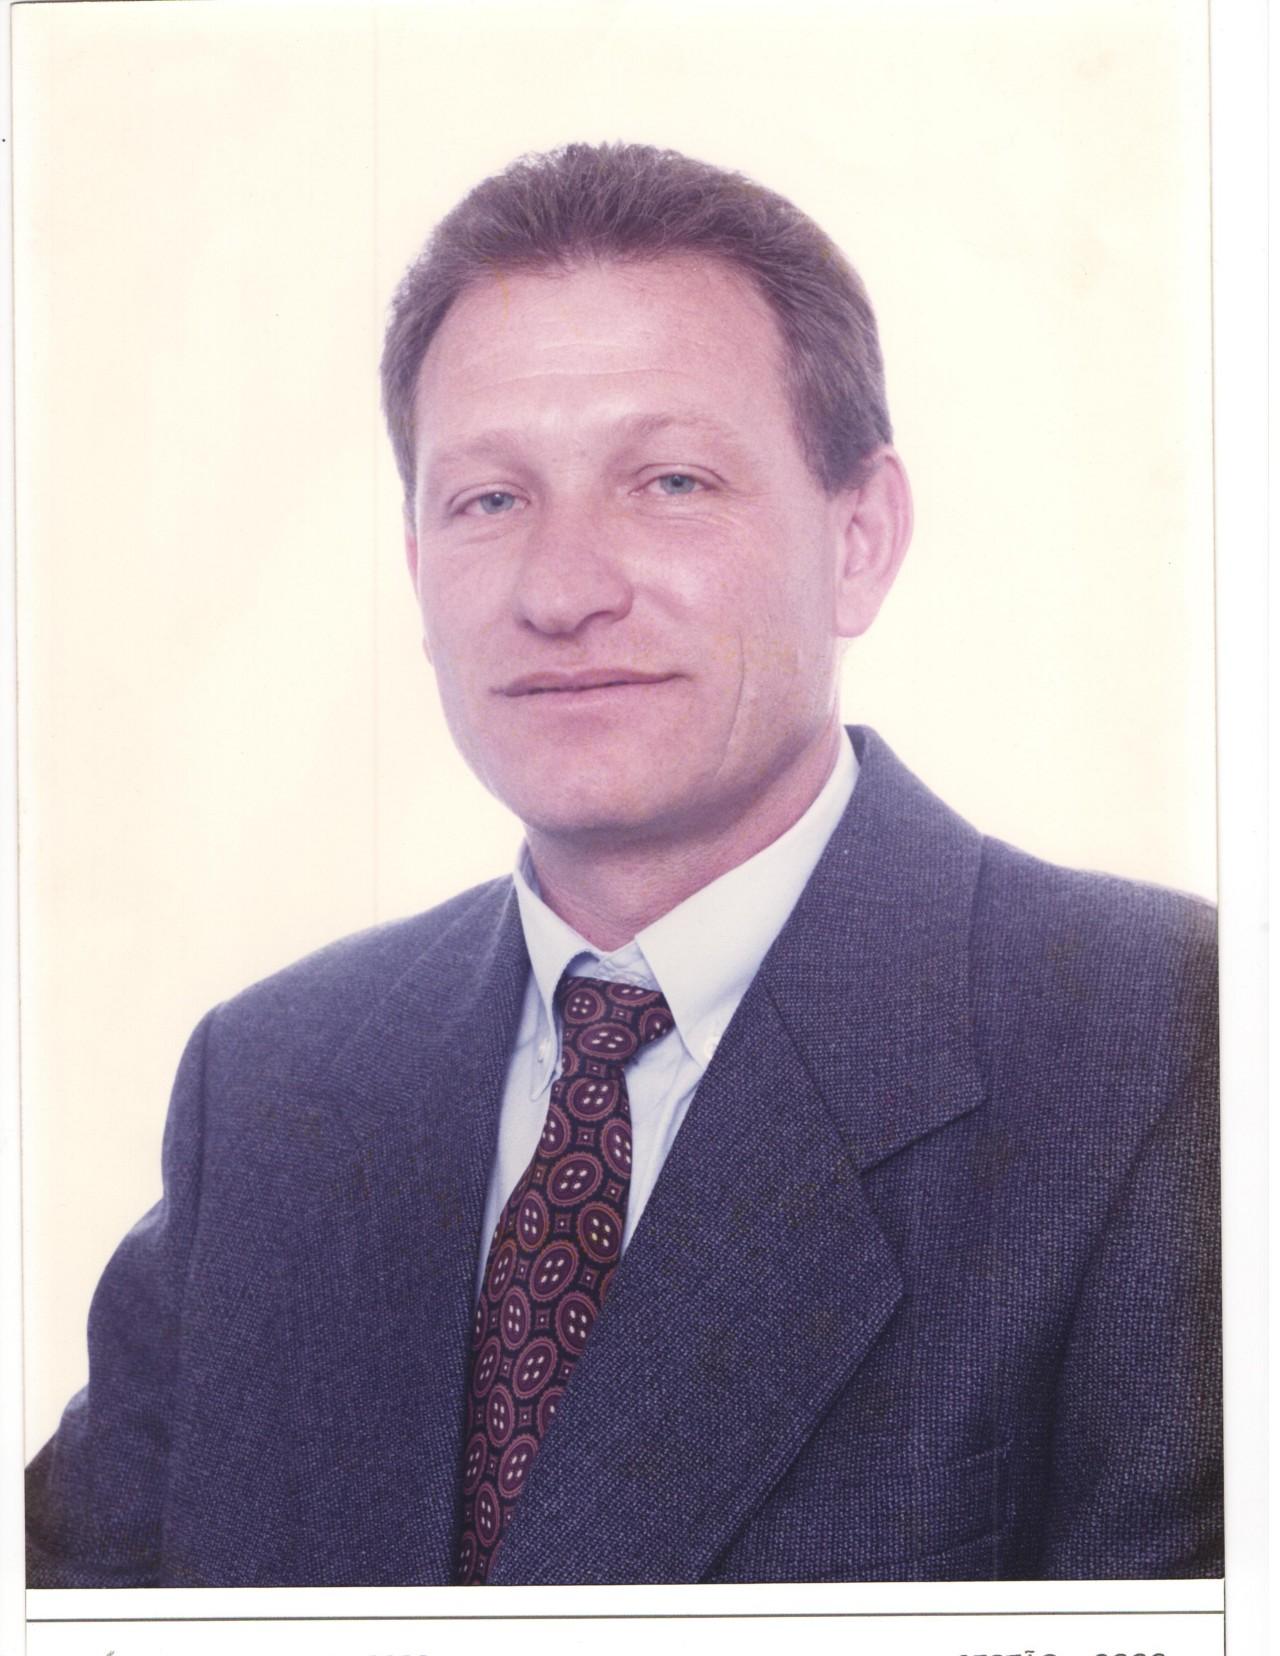 ELIO LUIZ TURCHETTO